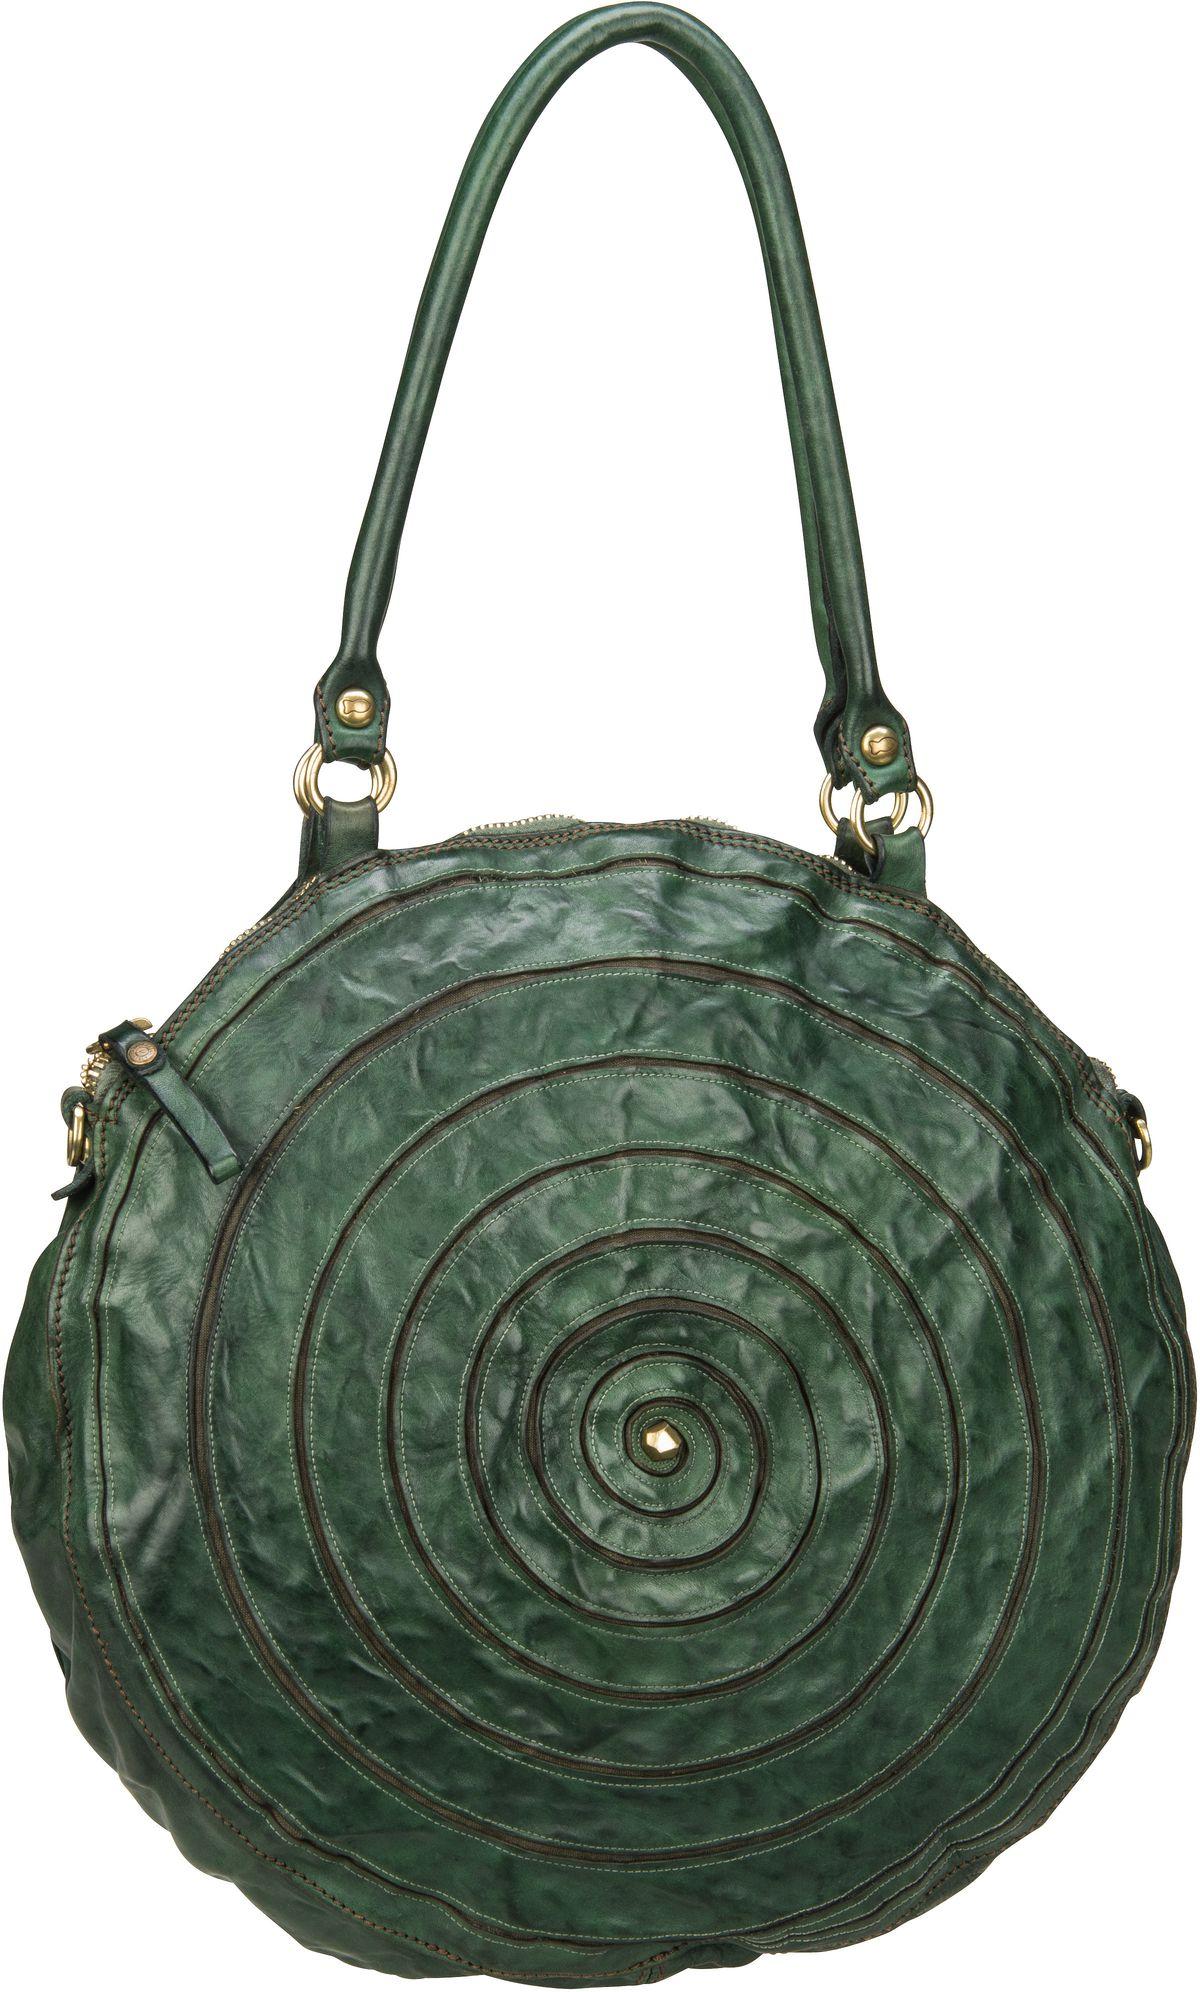 Handtasche Atena C16520 Verde Bottiglia